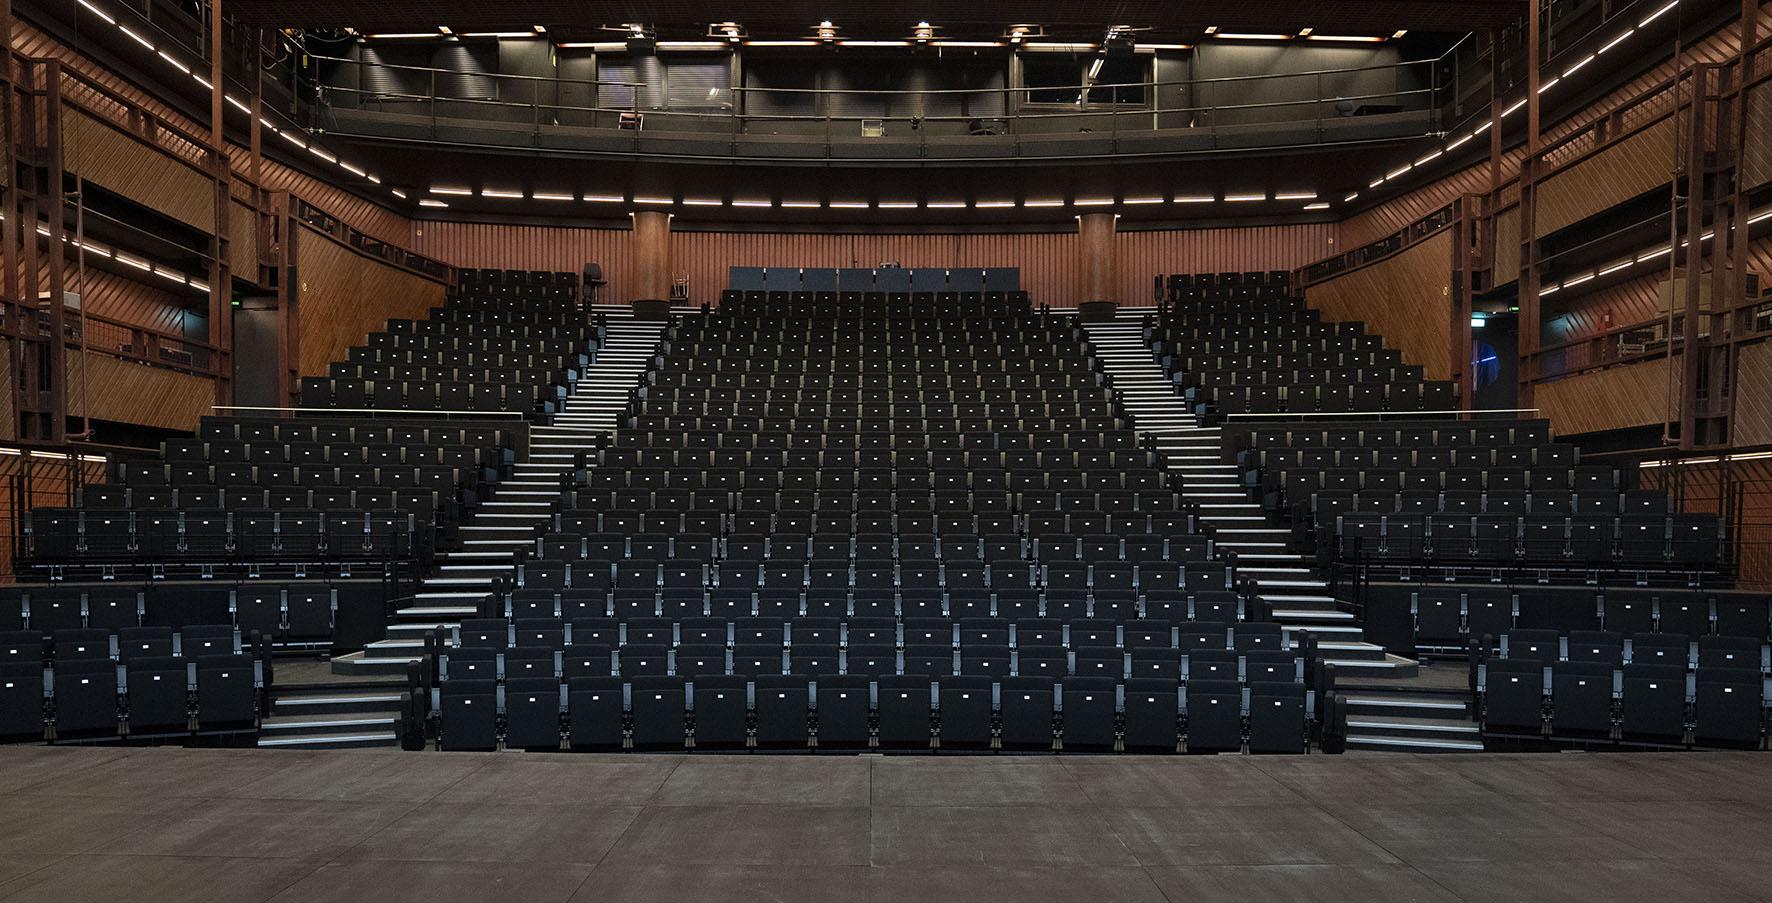 Espaces La Colline Theatre National